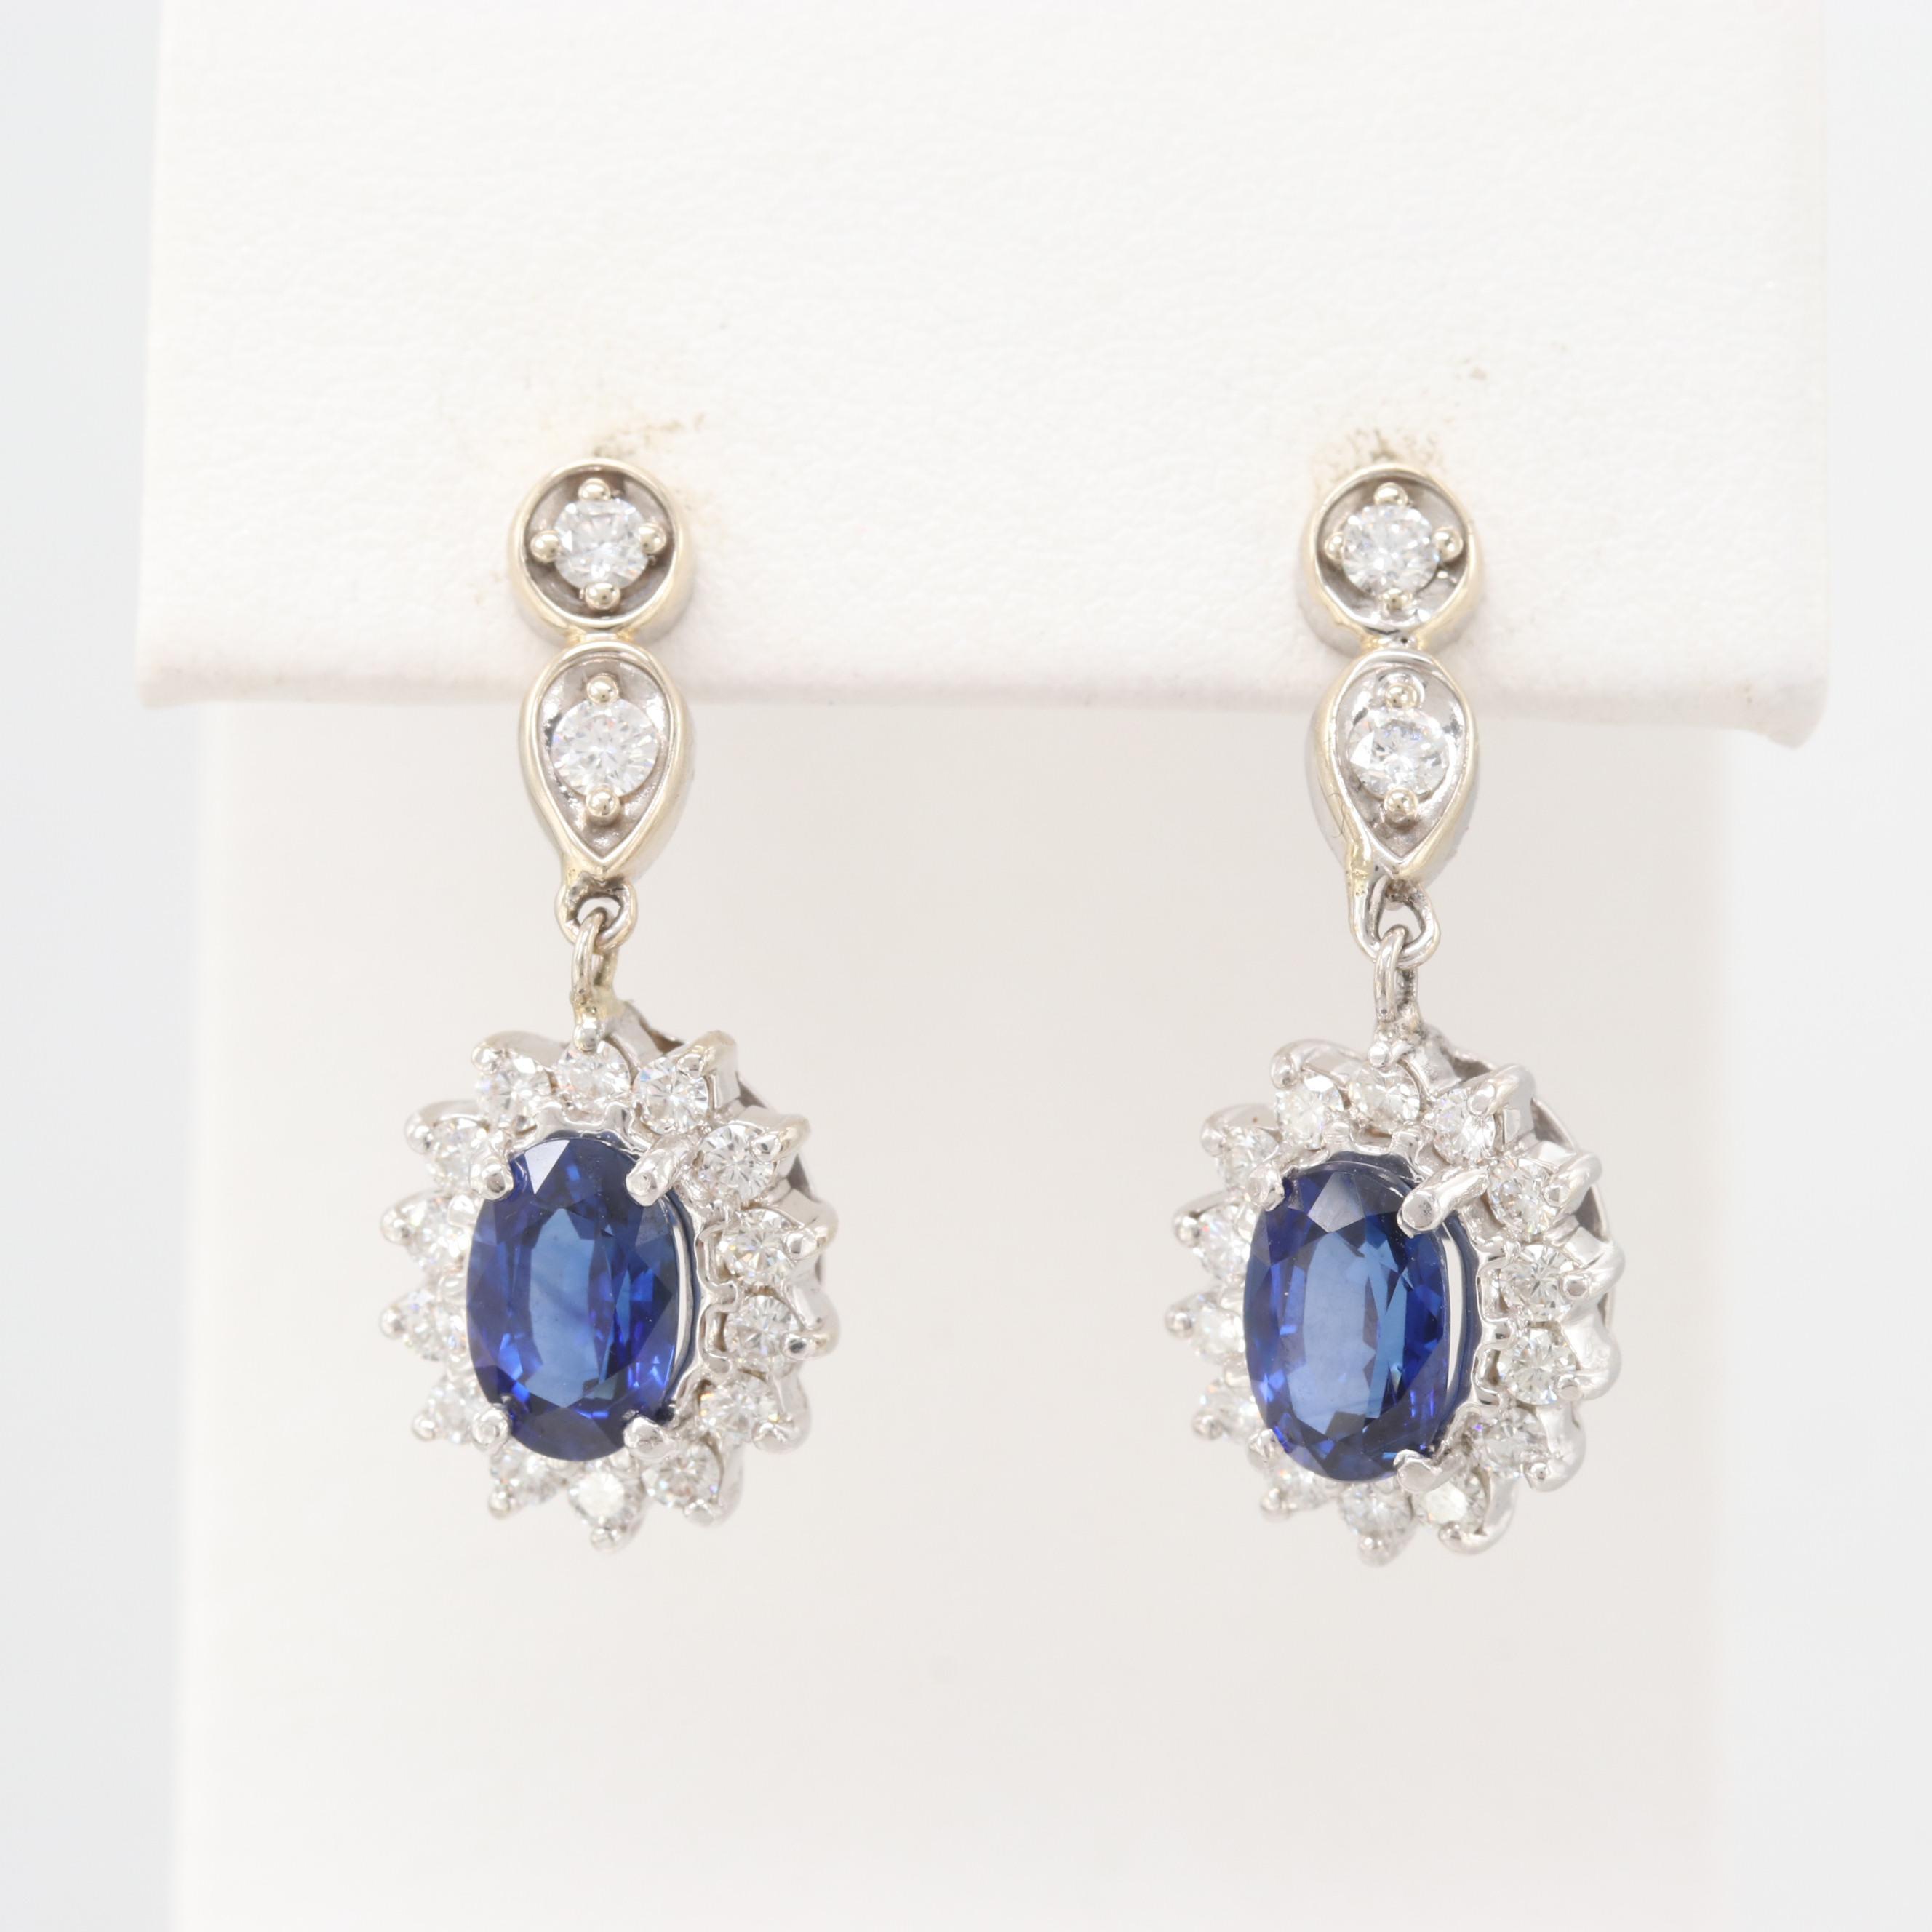 14K White Gold Blue Sapphire and Diamond Dangle Earrings